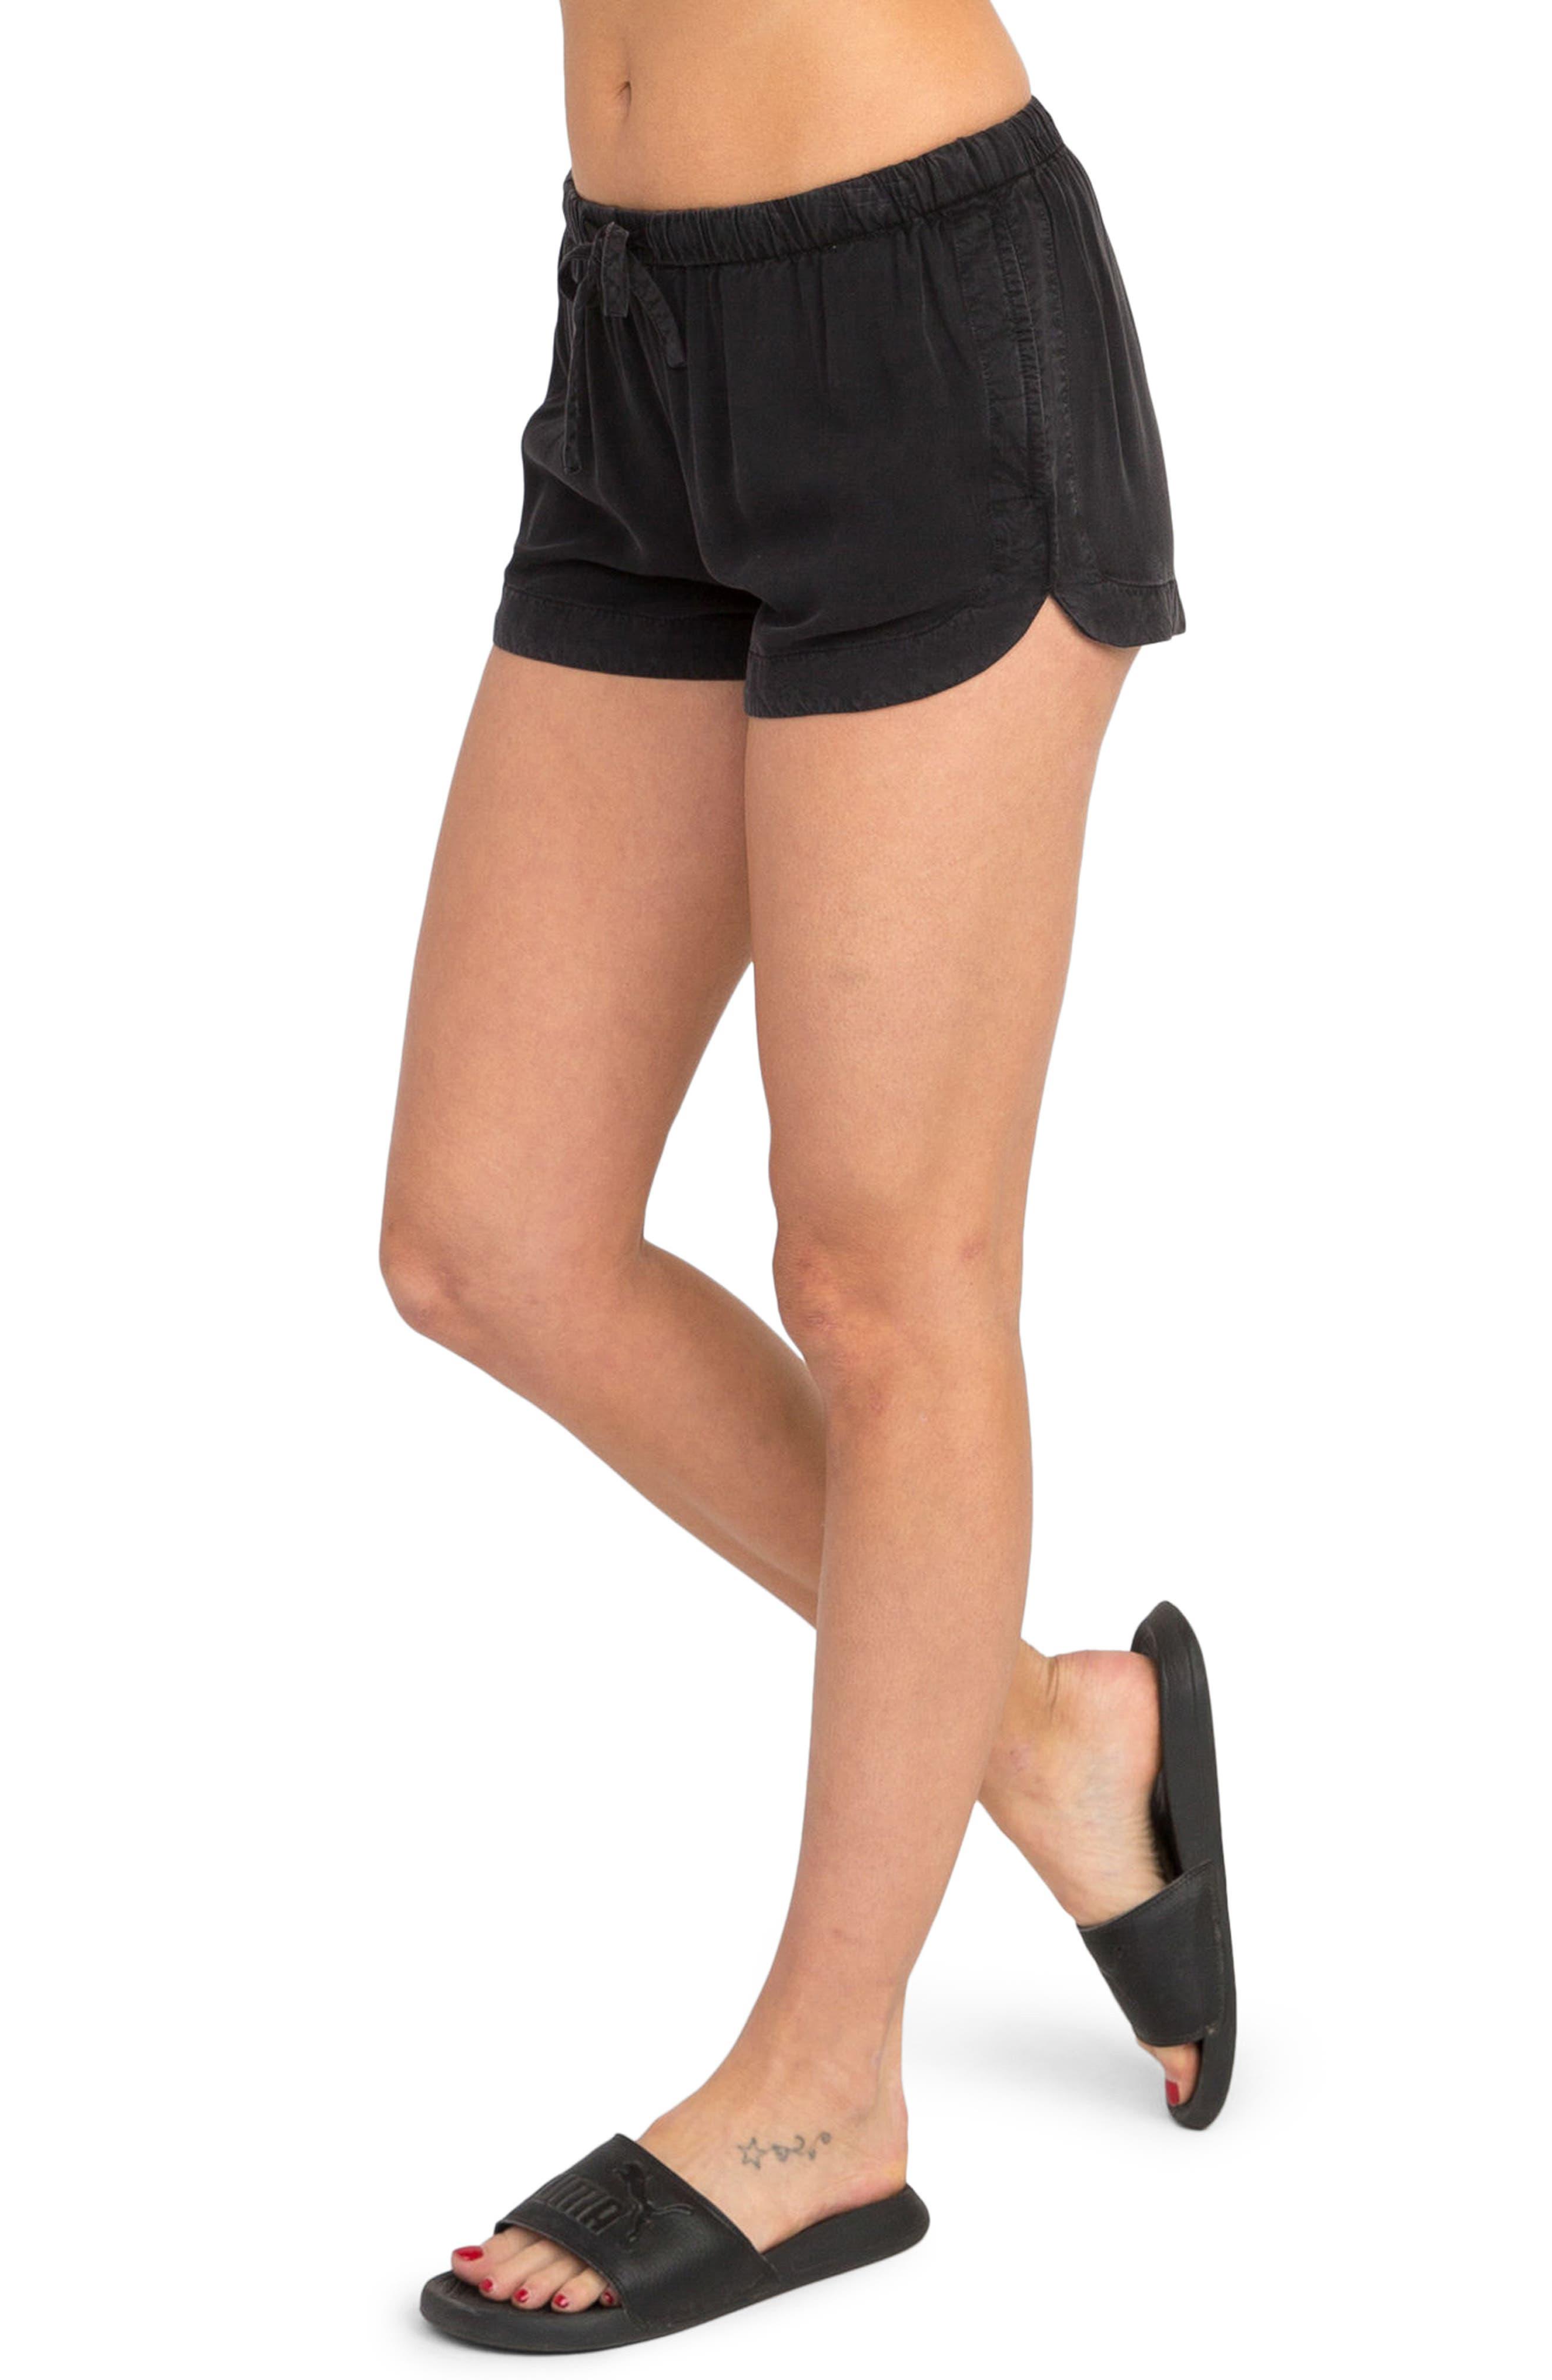 New Yume Dolphin Shorts,                             Alternate thumbnail 5, color,                             Black